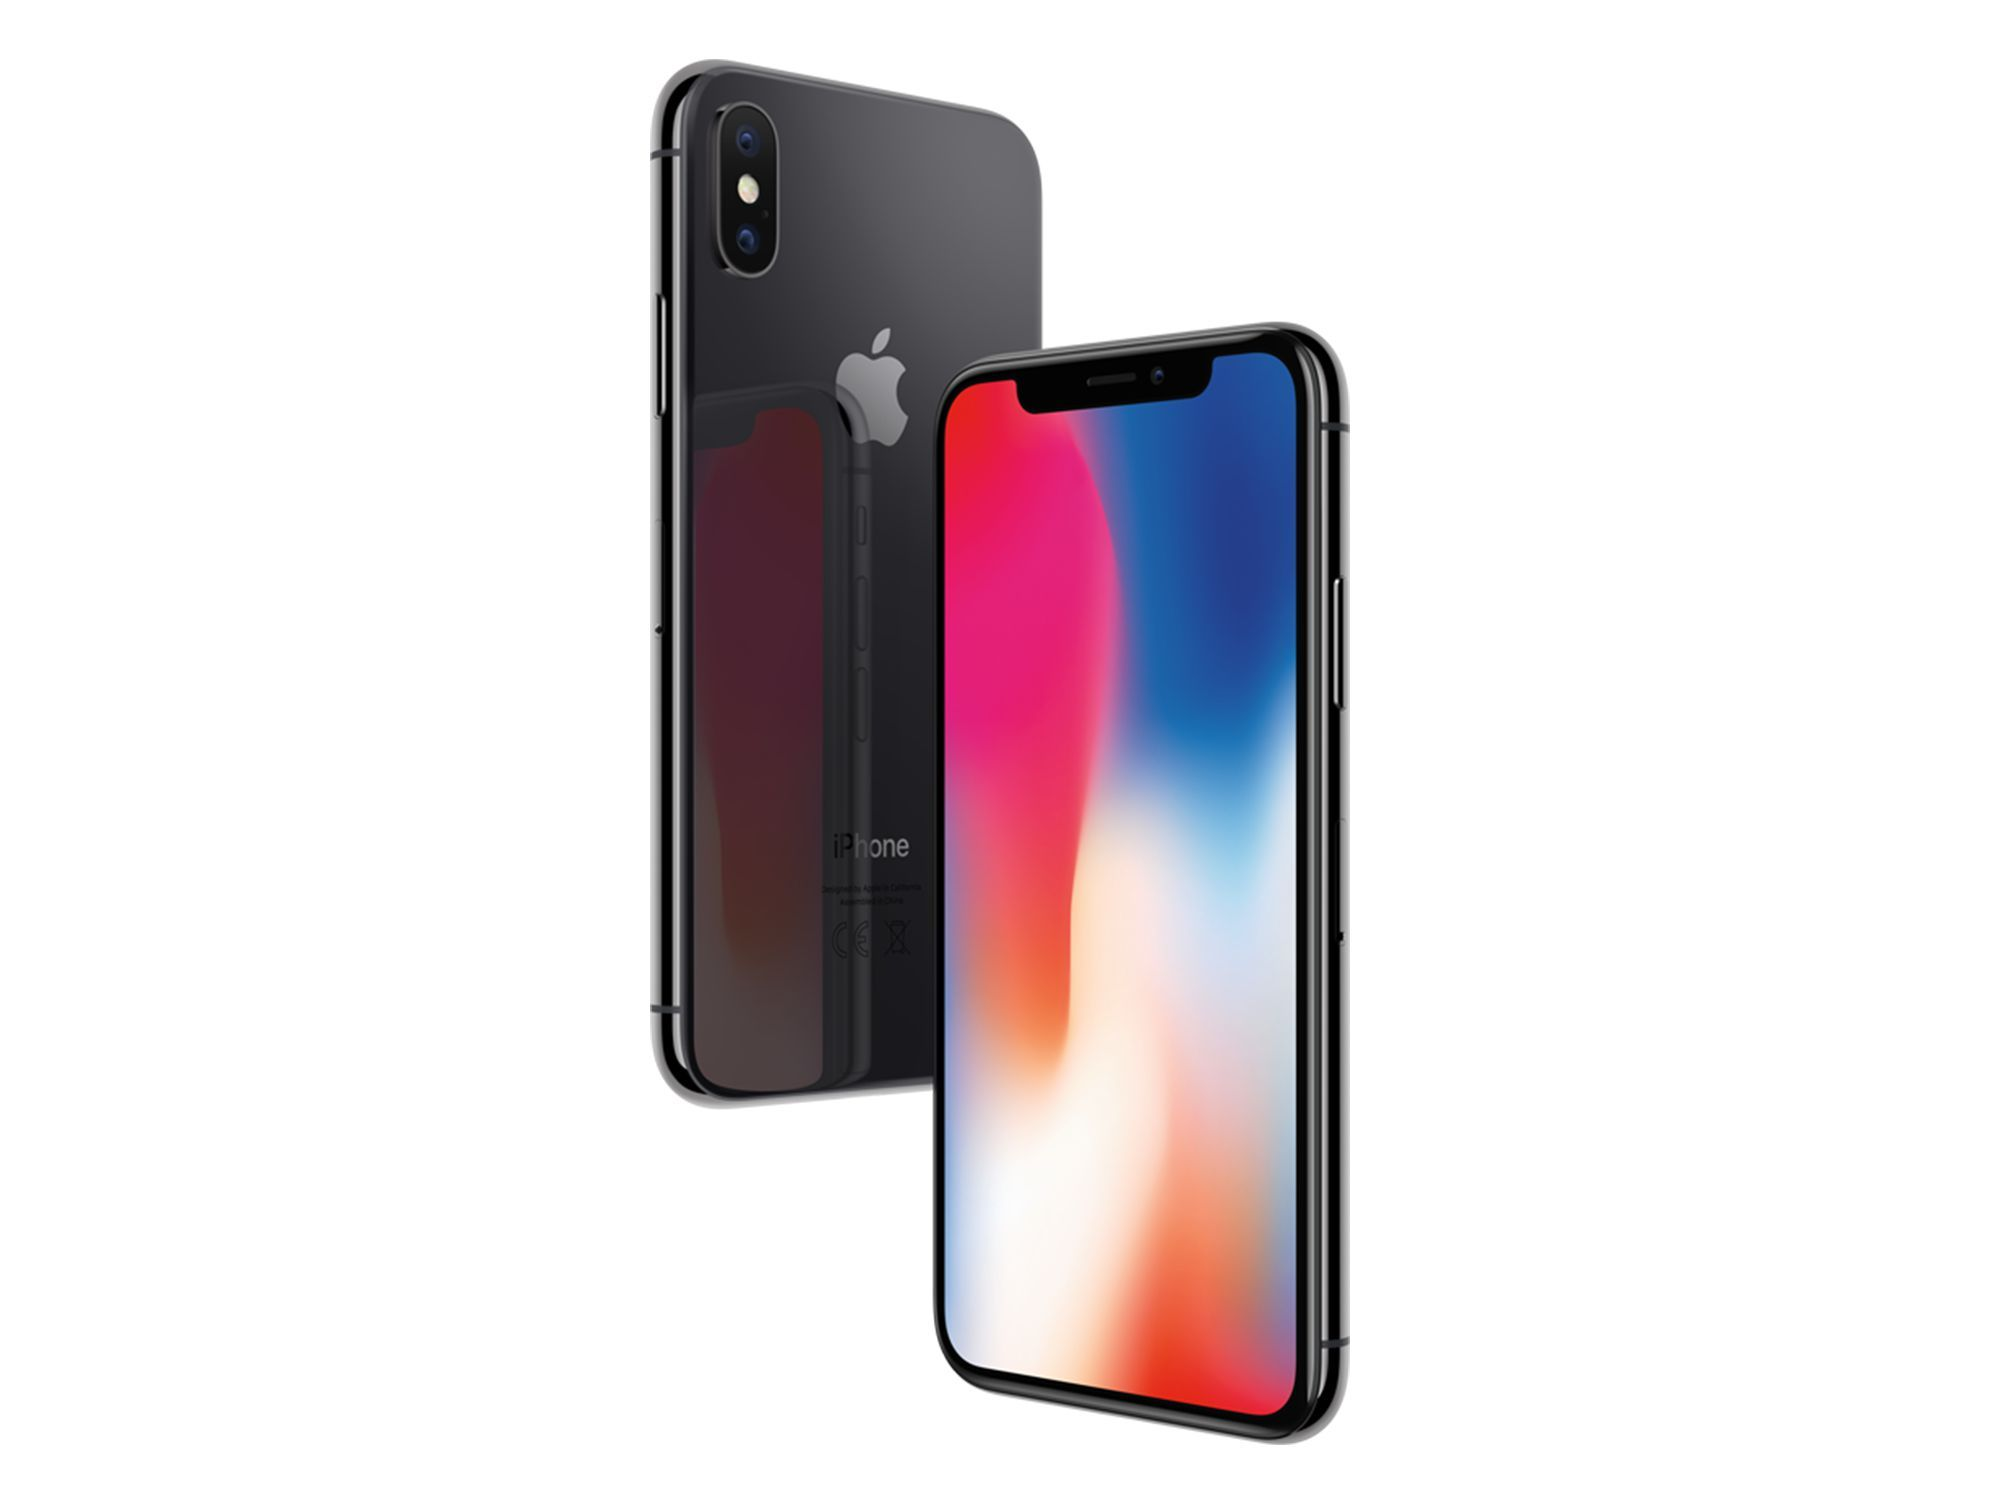 Apple Iphone X 256 Gb Space Grau Online Kaufen Im Gravis Shop Autorisierter Apple Handler Apple Iphone Iphone Telefon